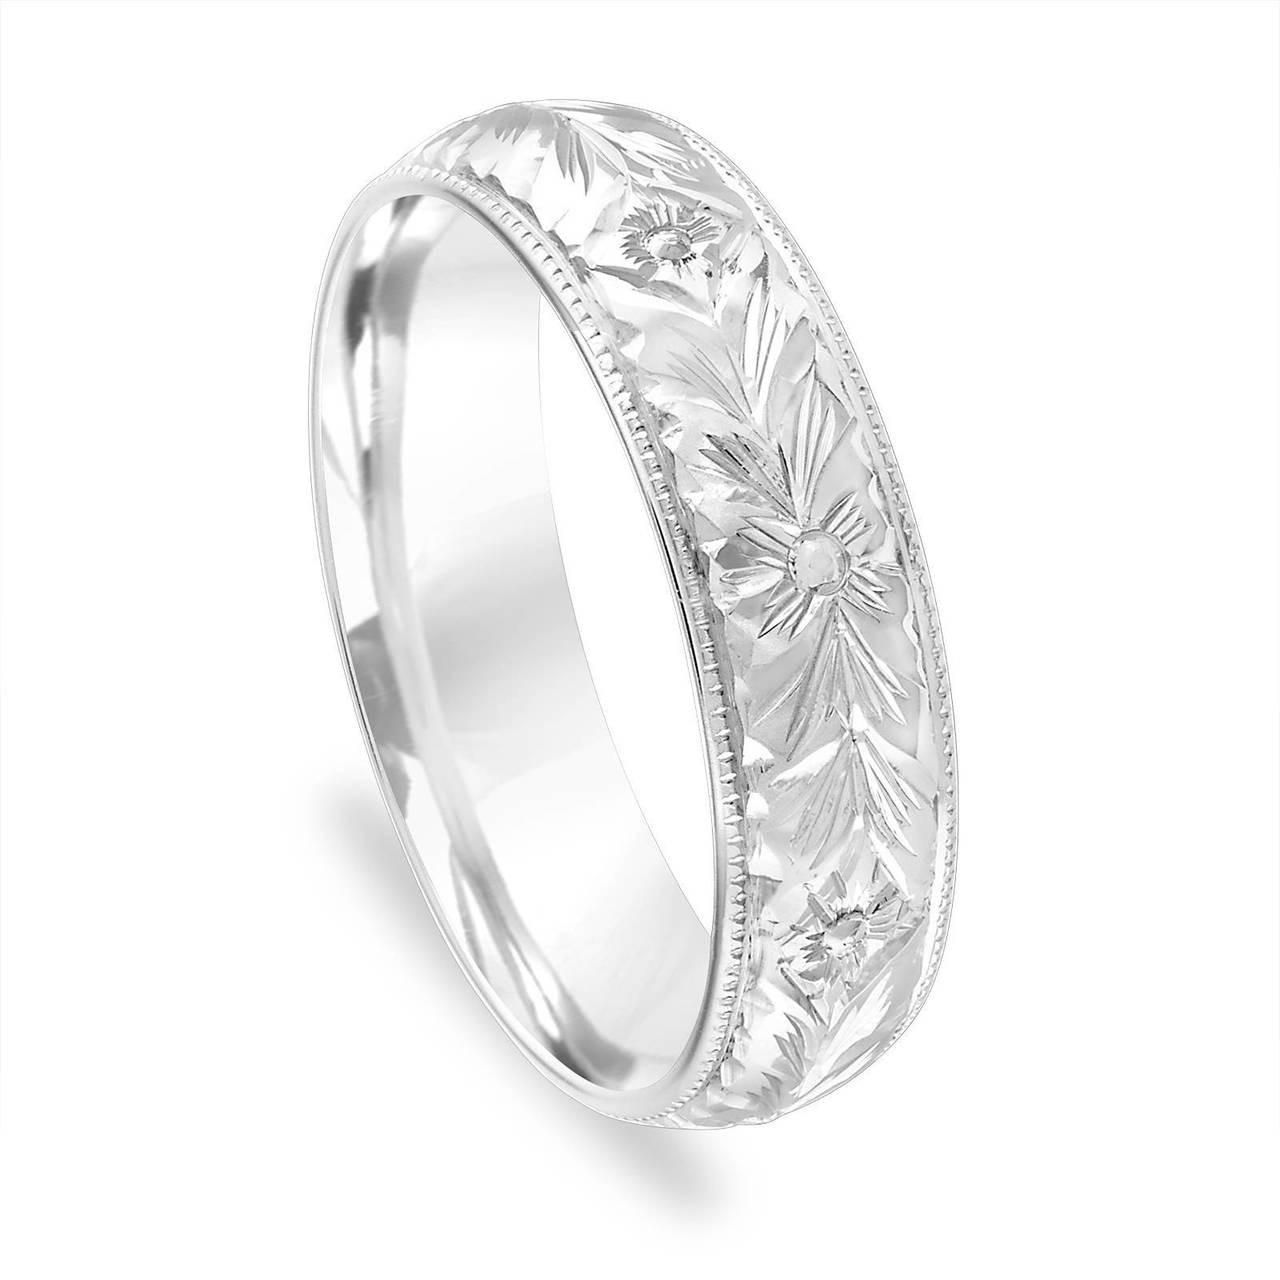 Hand Engraved Wedding Band, Mens Vintage Wedding Ring, 5